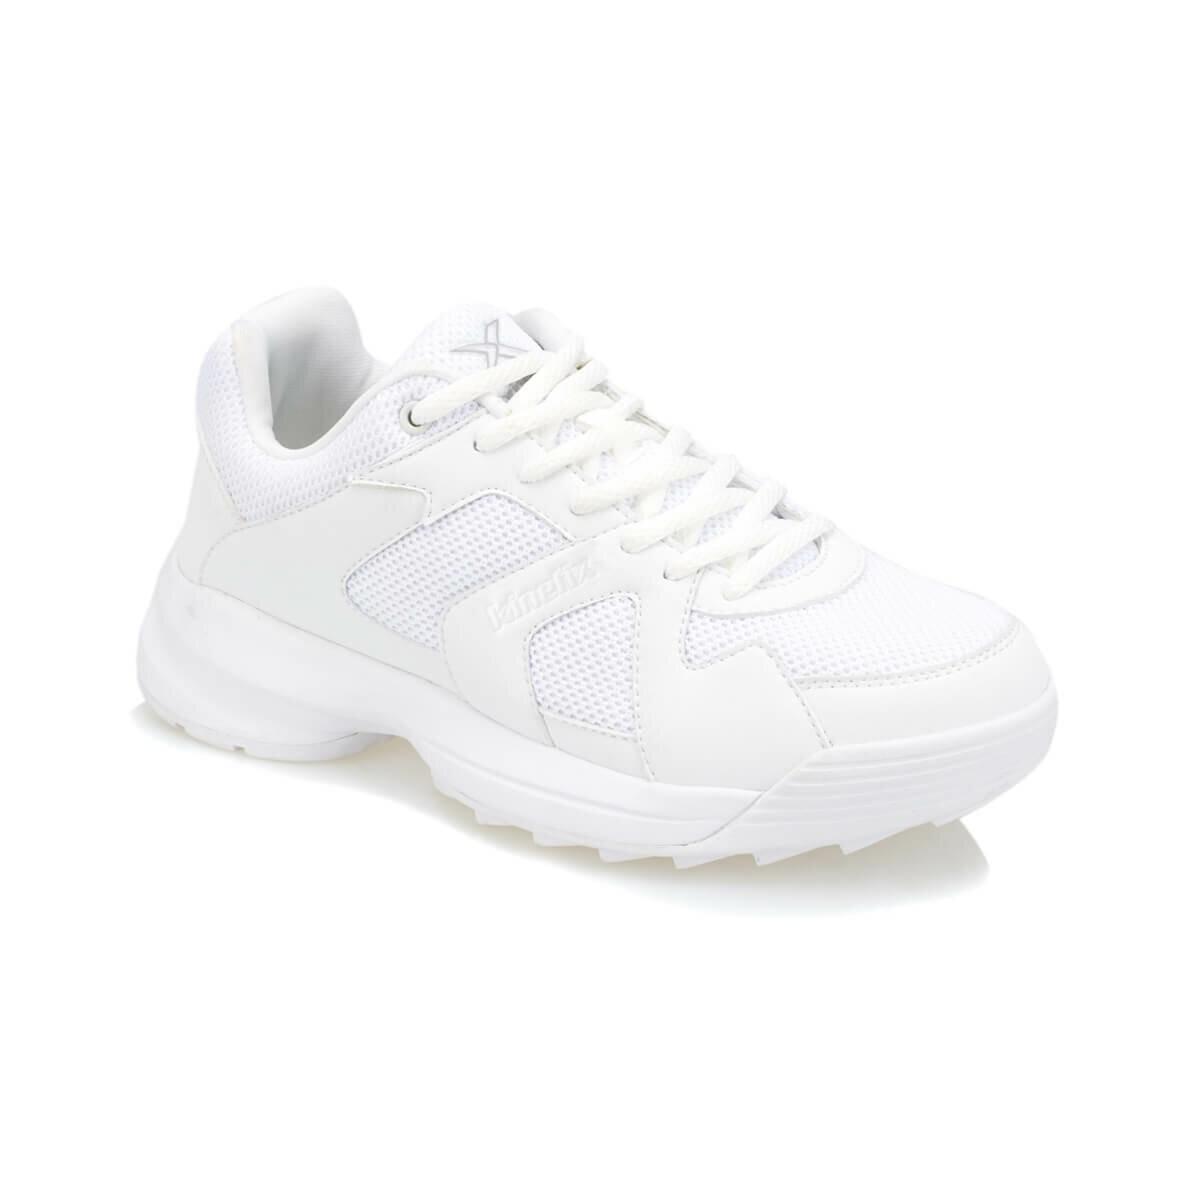 FLO ESTER W White Women 'S Sneaker Shoes KINETIX